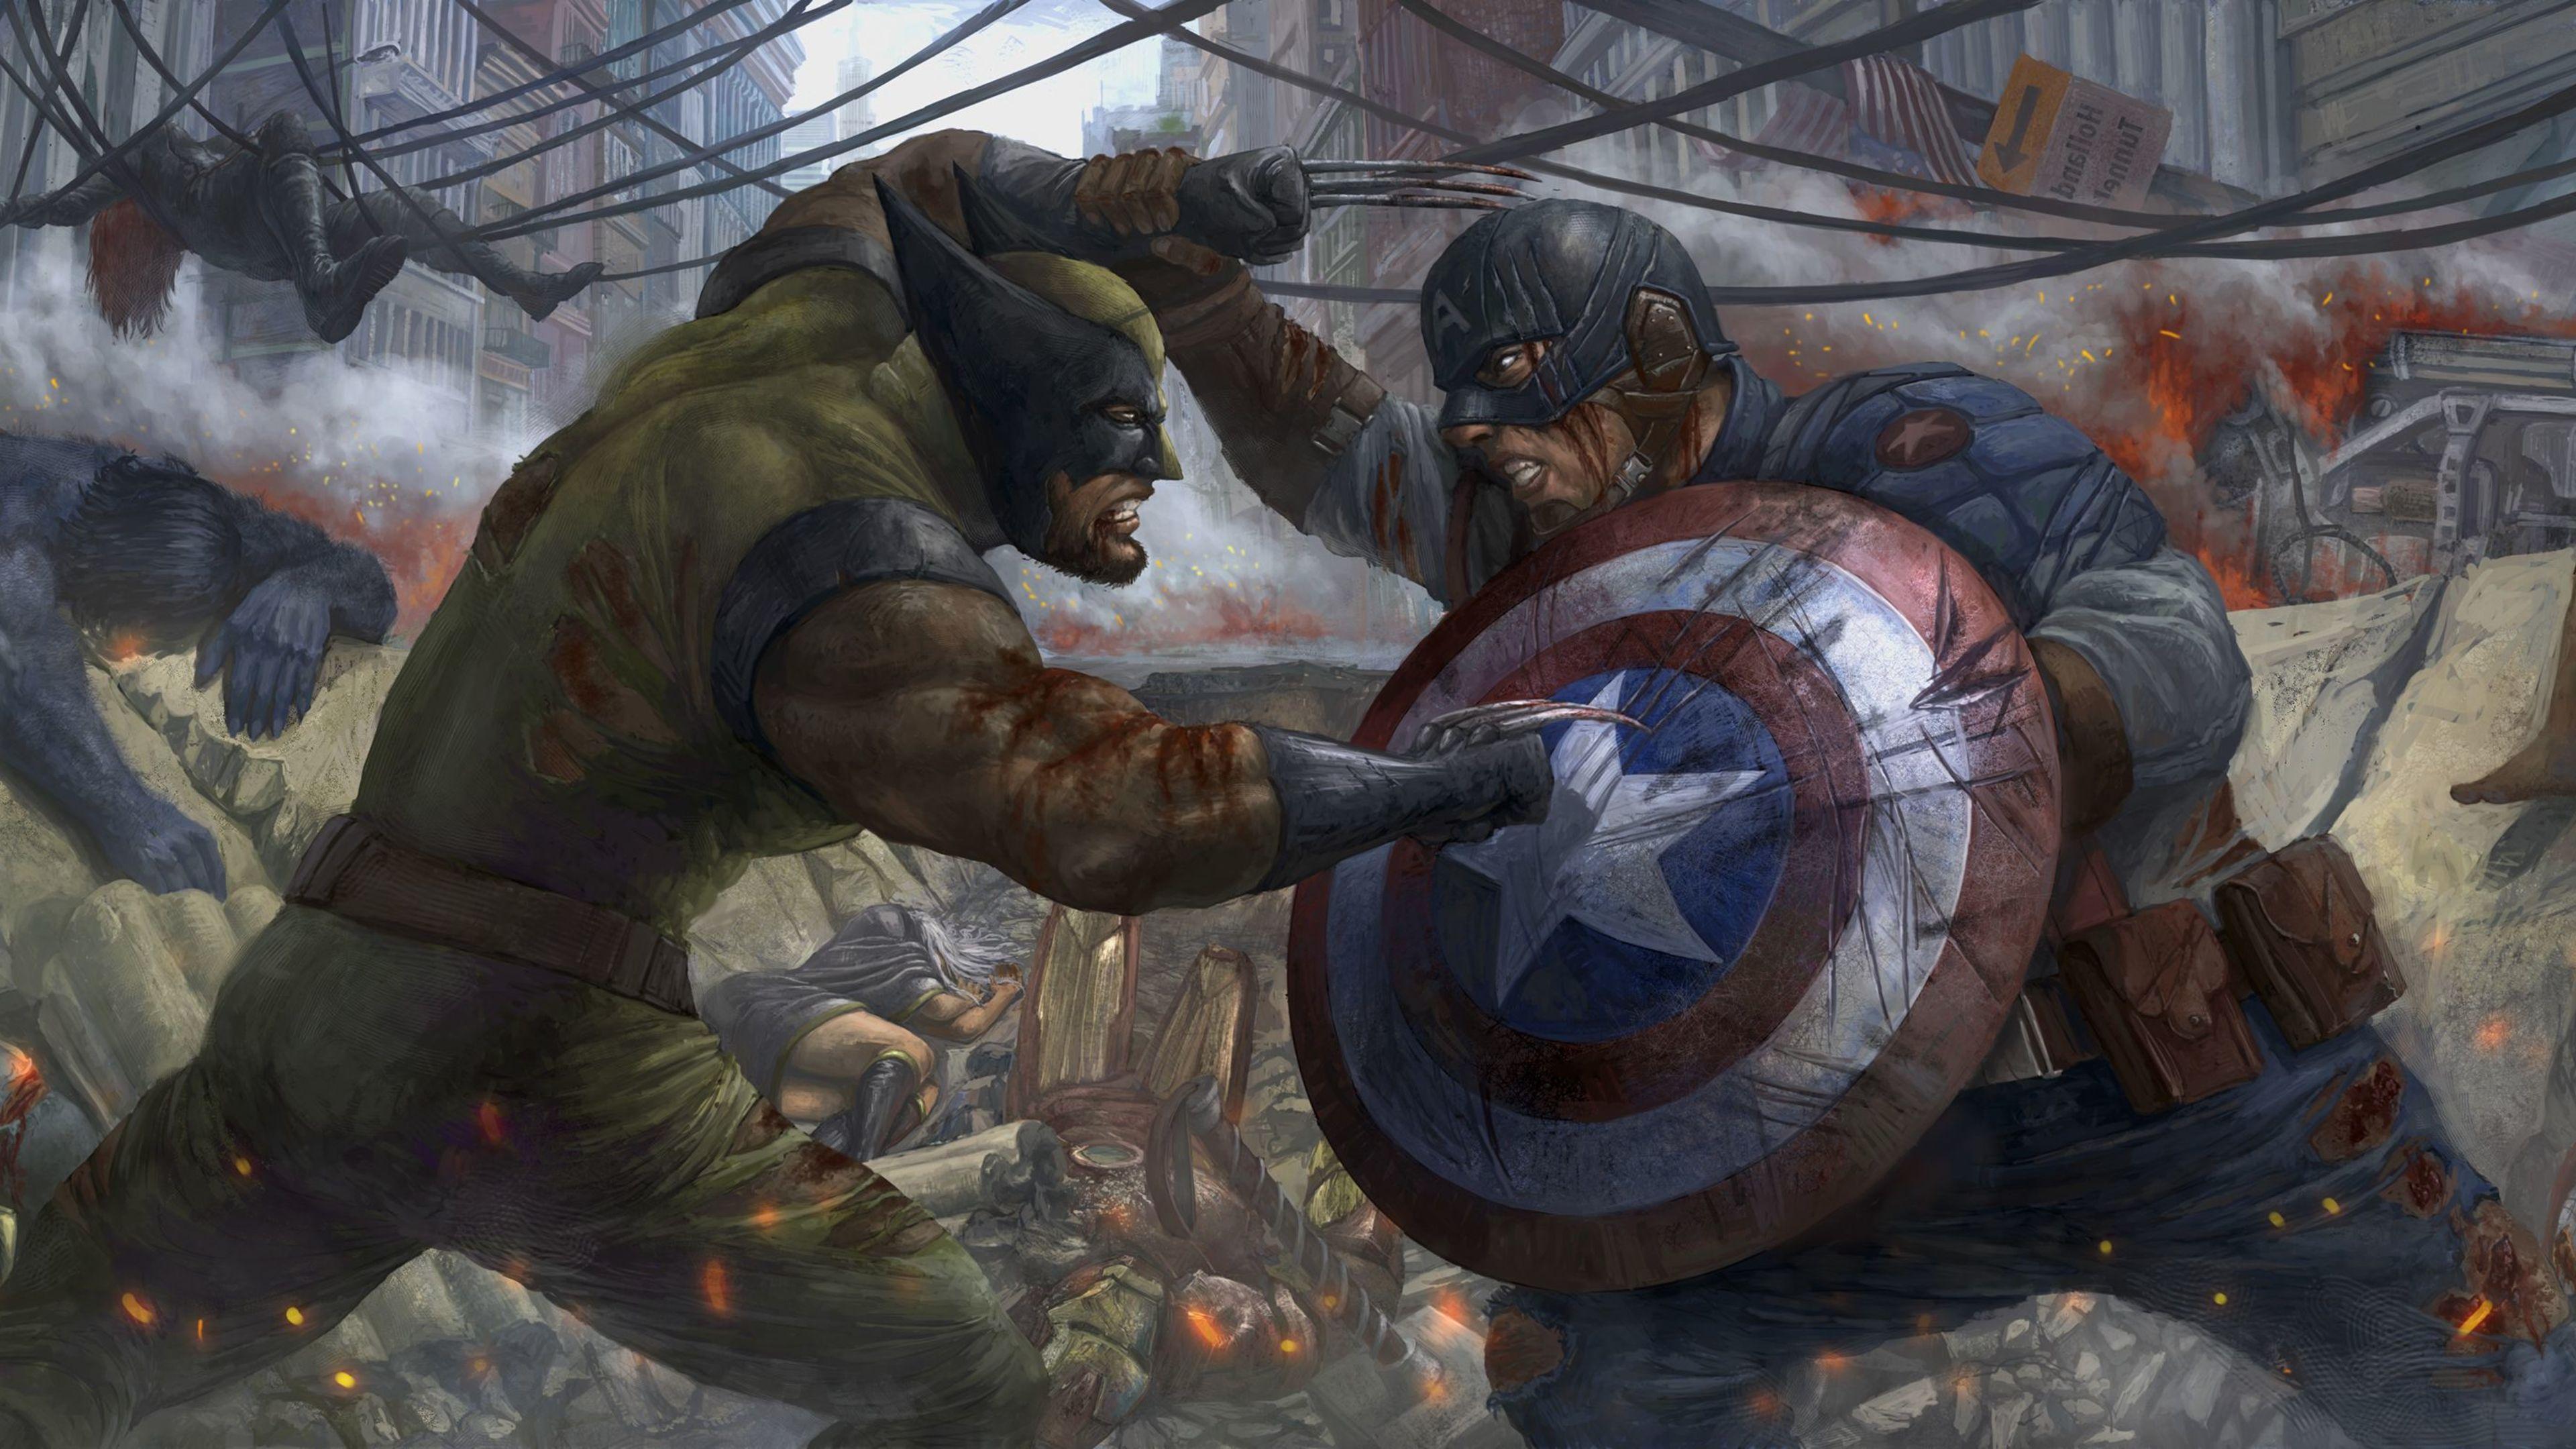 captain america vs wolverine 1536522730 - Captain America Vs Wolverine - wolverine wallpapers, superheroes wallpapers, hd-wallpapers, digital art wallpapers, captain america wallpapers, artwork wallpapers